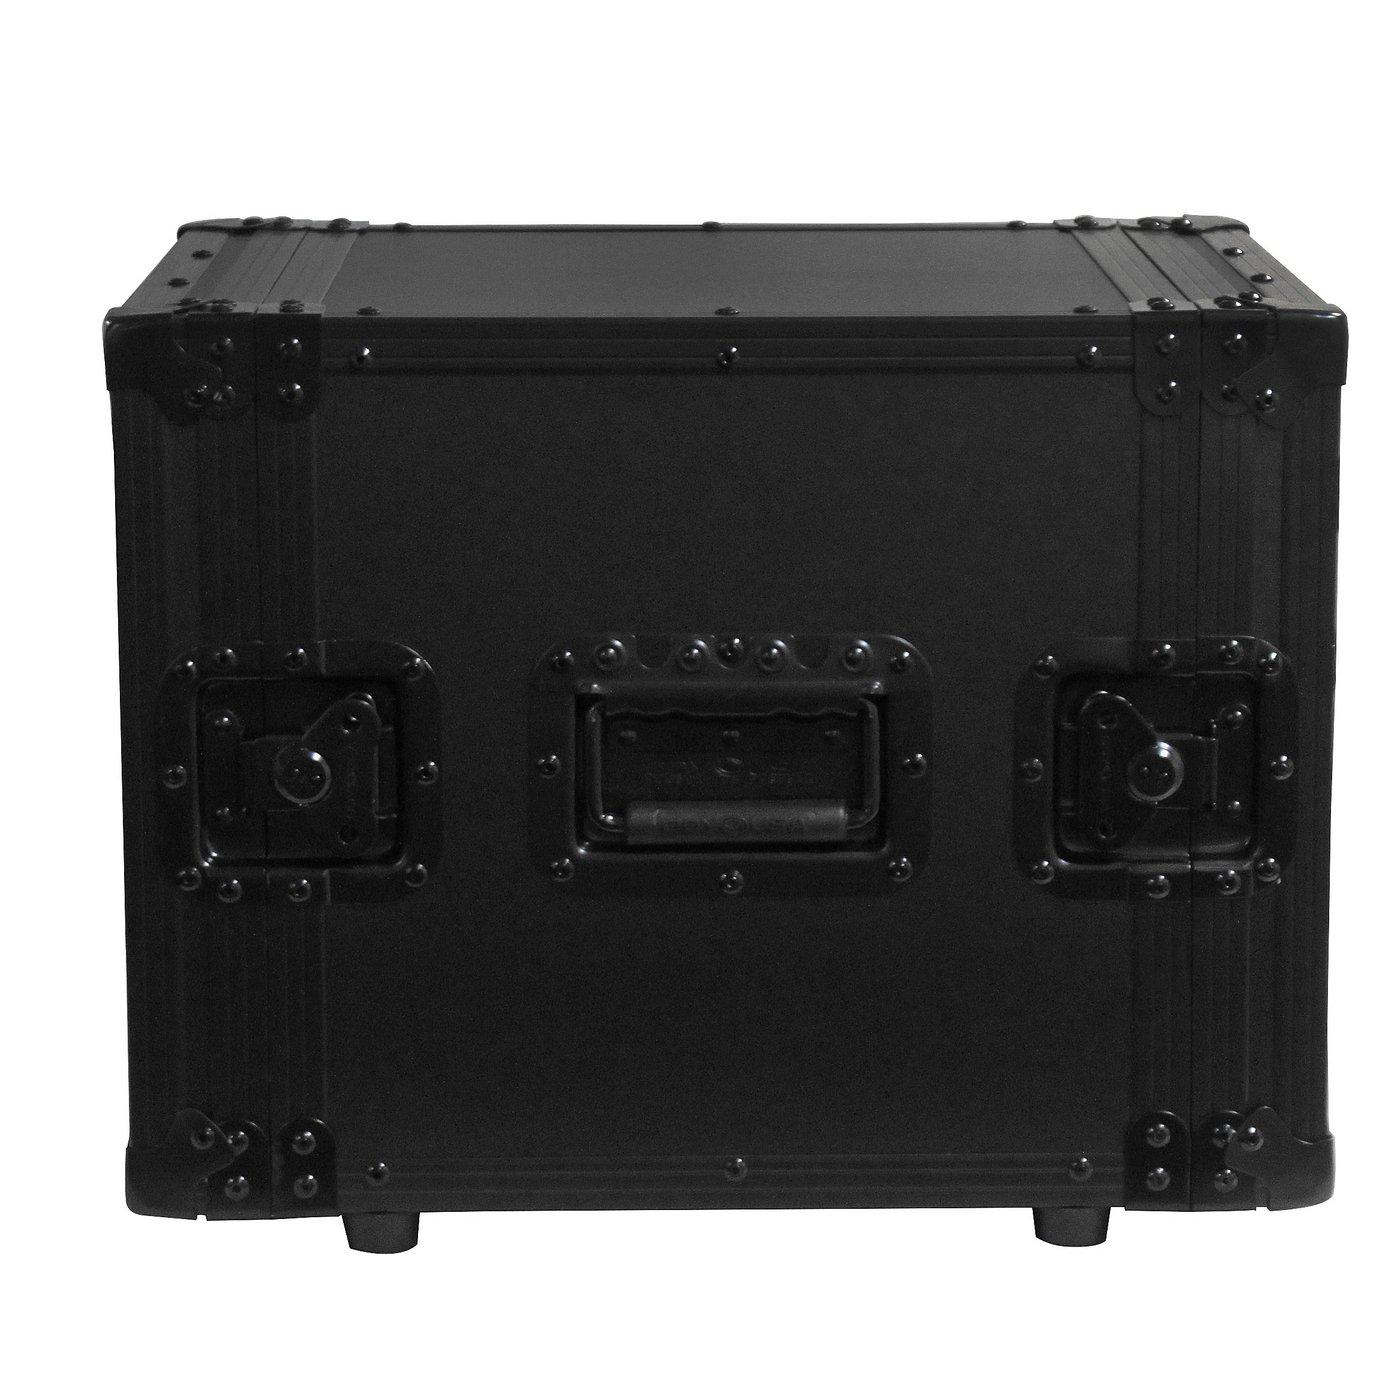 Odyssey Cases FZHIT520BL | HiTi P520L Compact Photo Printer Case Black Label